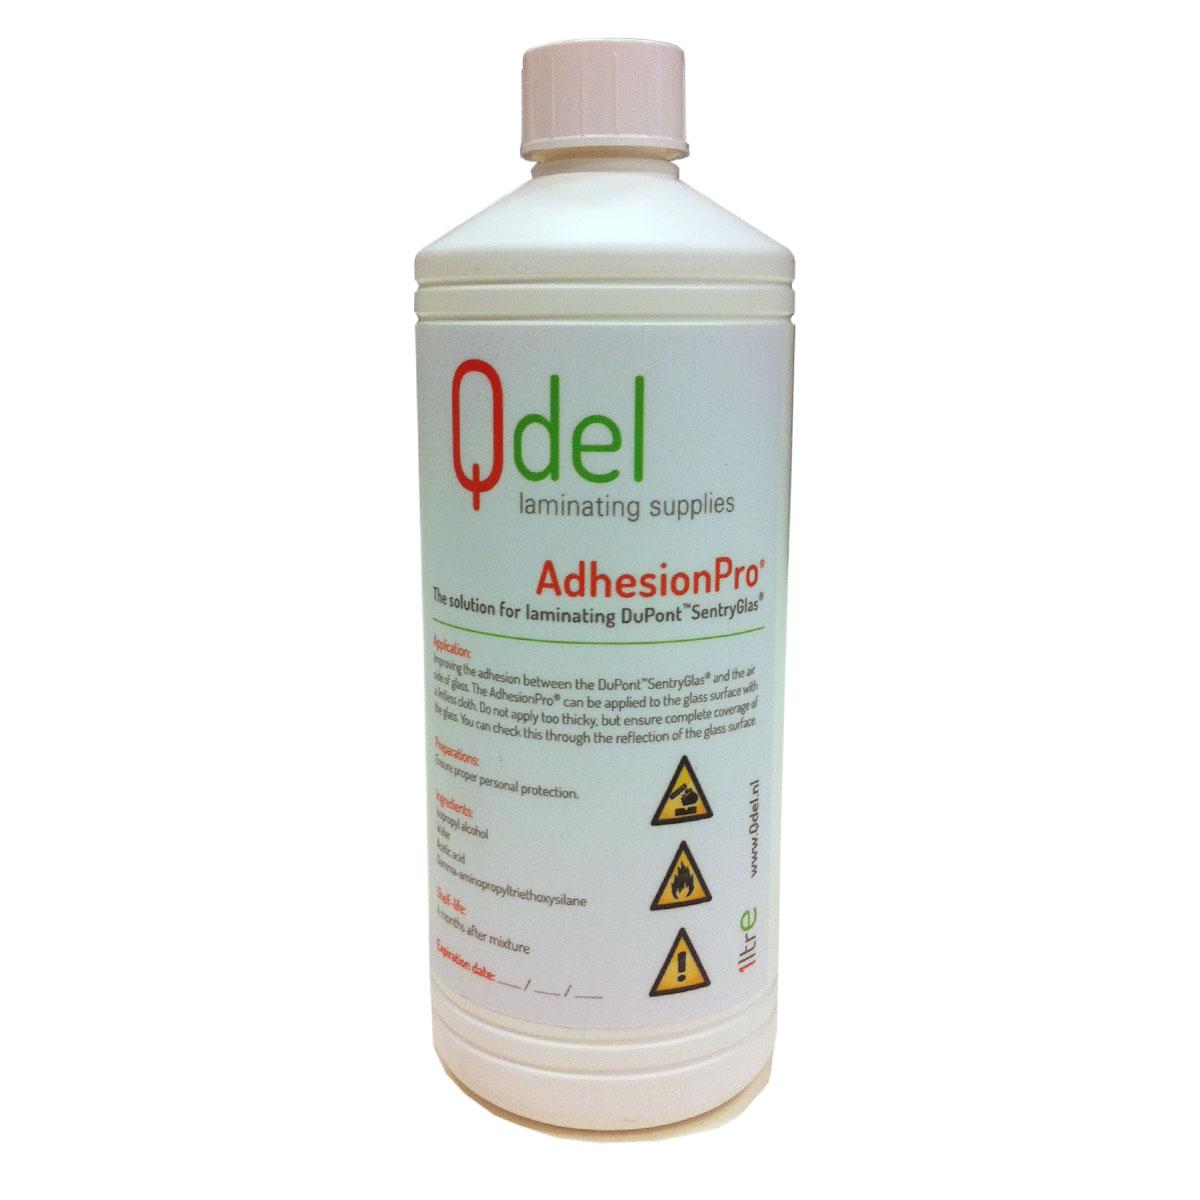 adhesionpro 1 litre